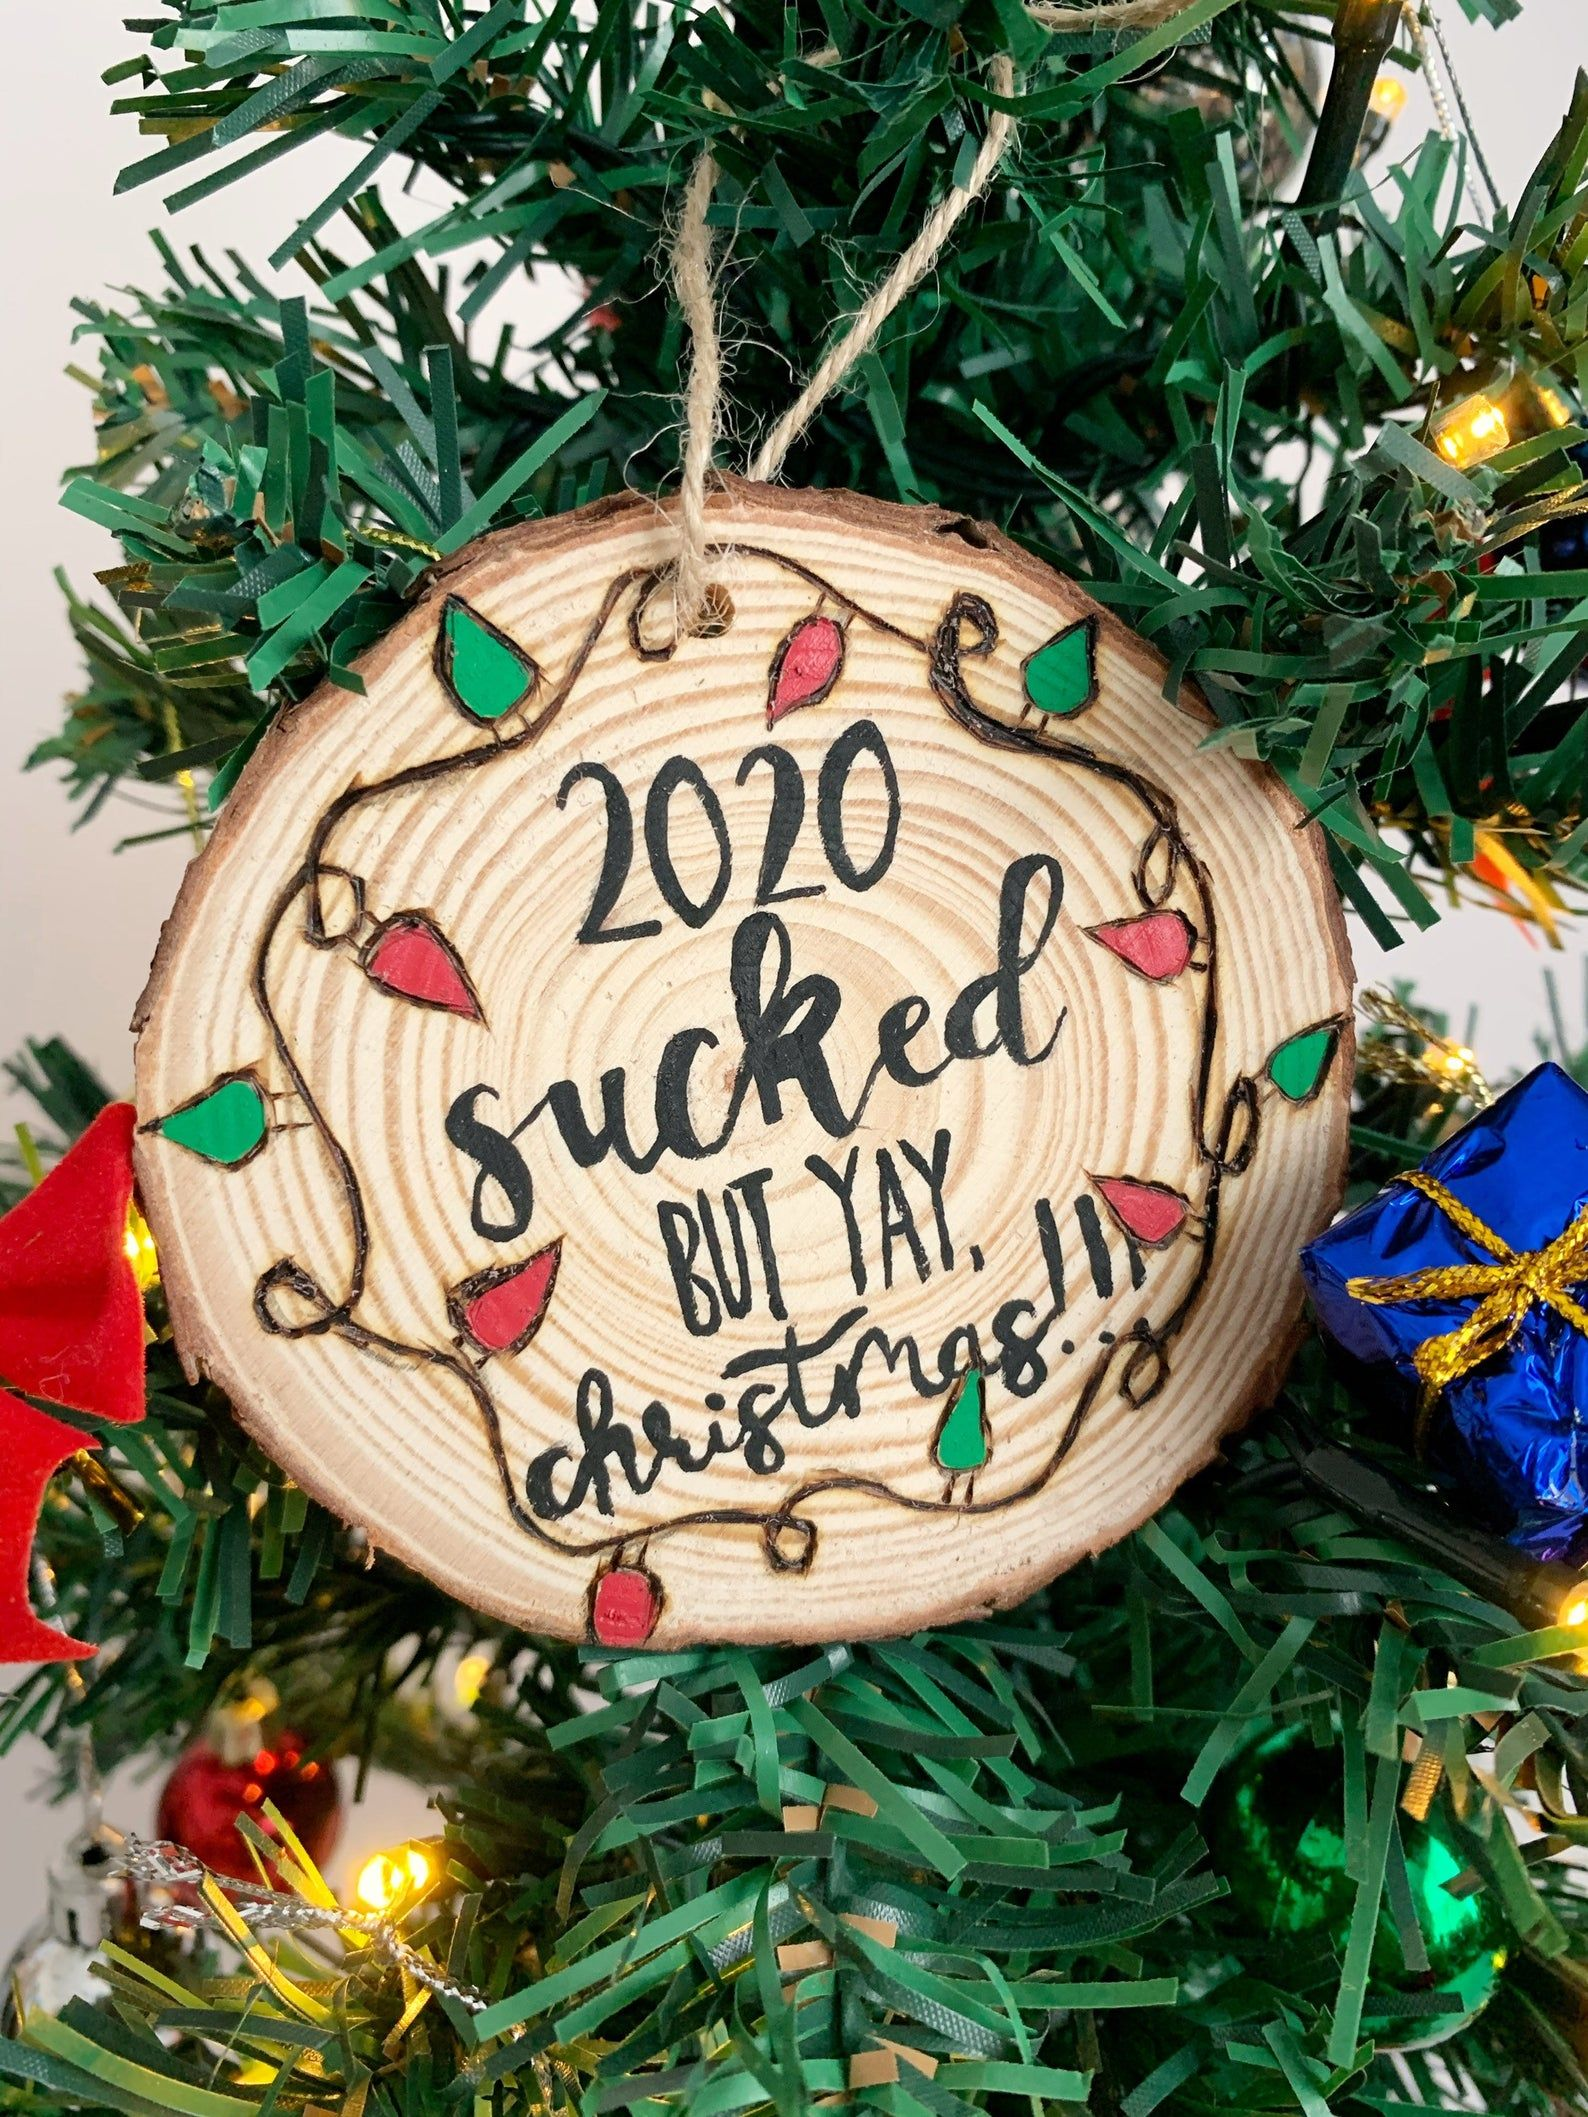 Christmas Ornaments 2020 Homemade 2020 Christmas Ornament 2020 survivor 2020 Wood Slice | Etsy in